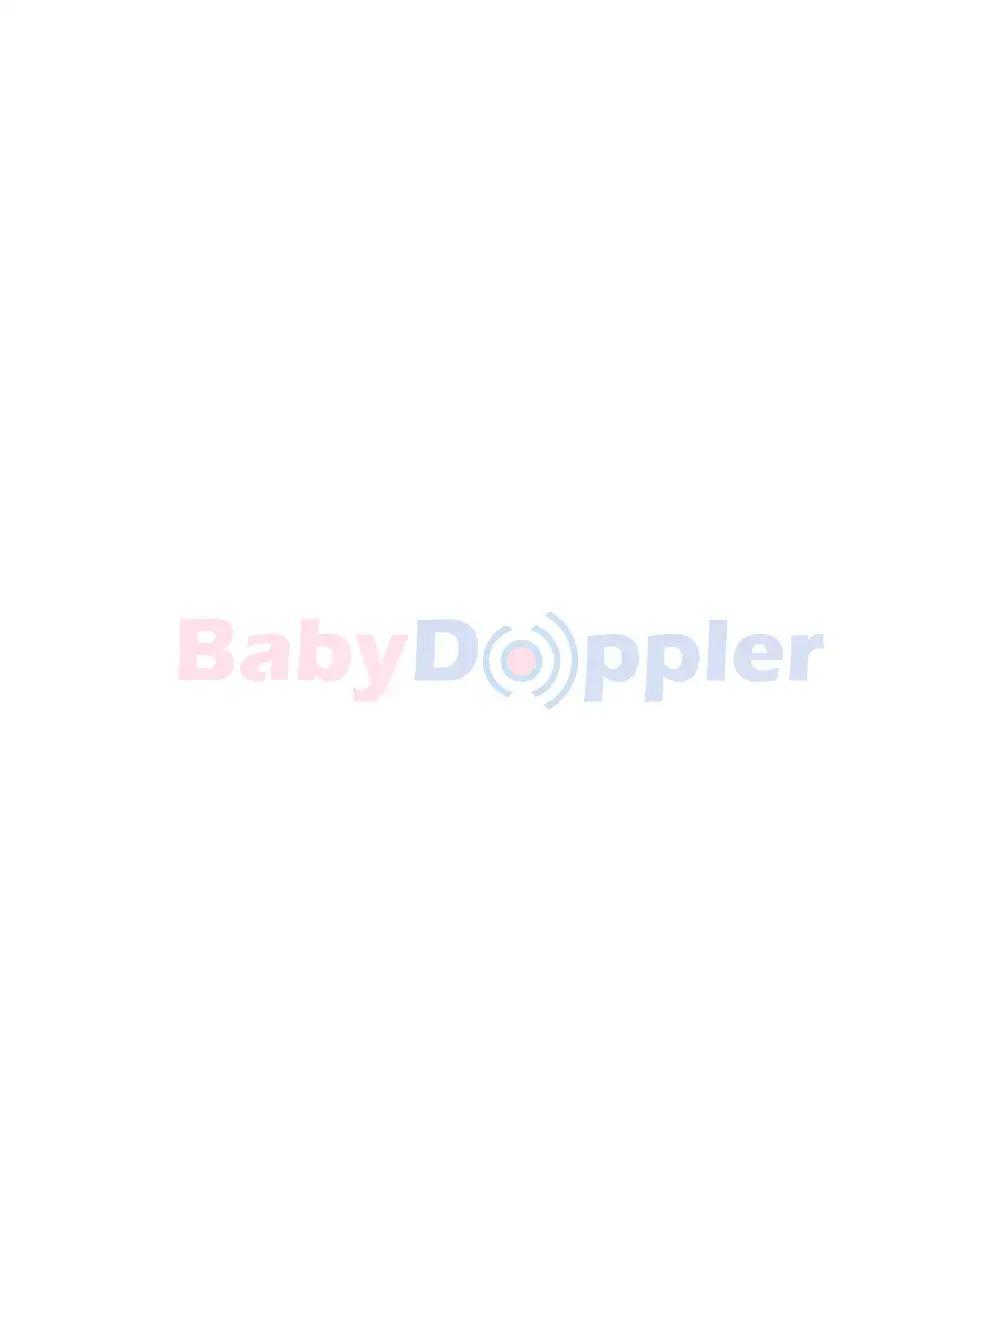 Zahler Mighty Mini Prenatal DHA, One a Day Prenatal Vitamins With DHA, Vegan, Certified Kosher, 90 Softgels